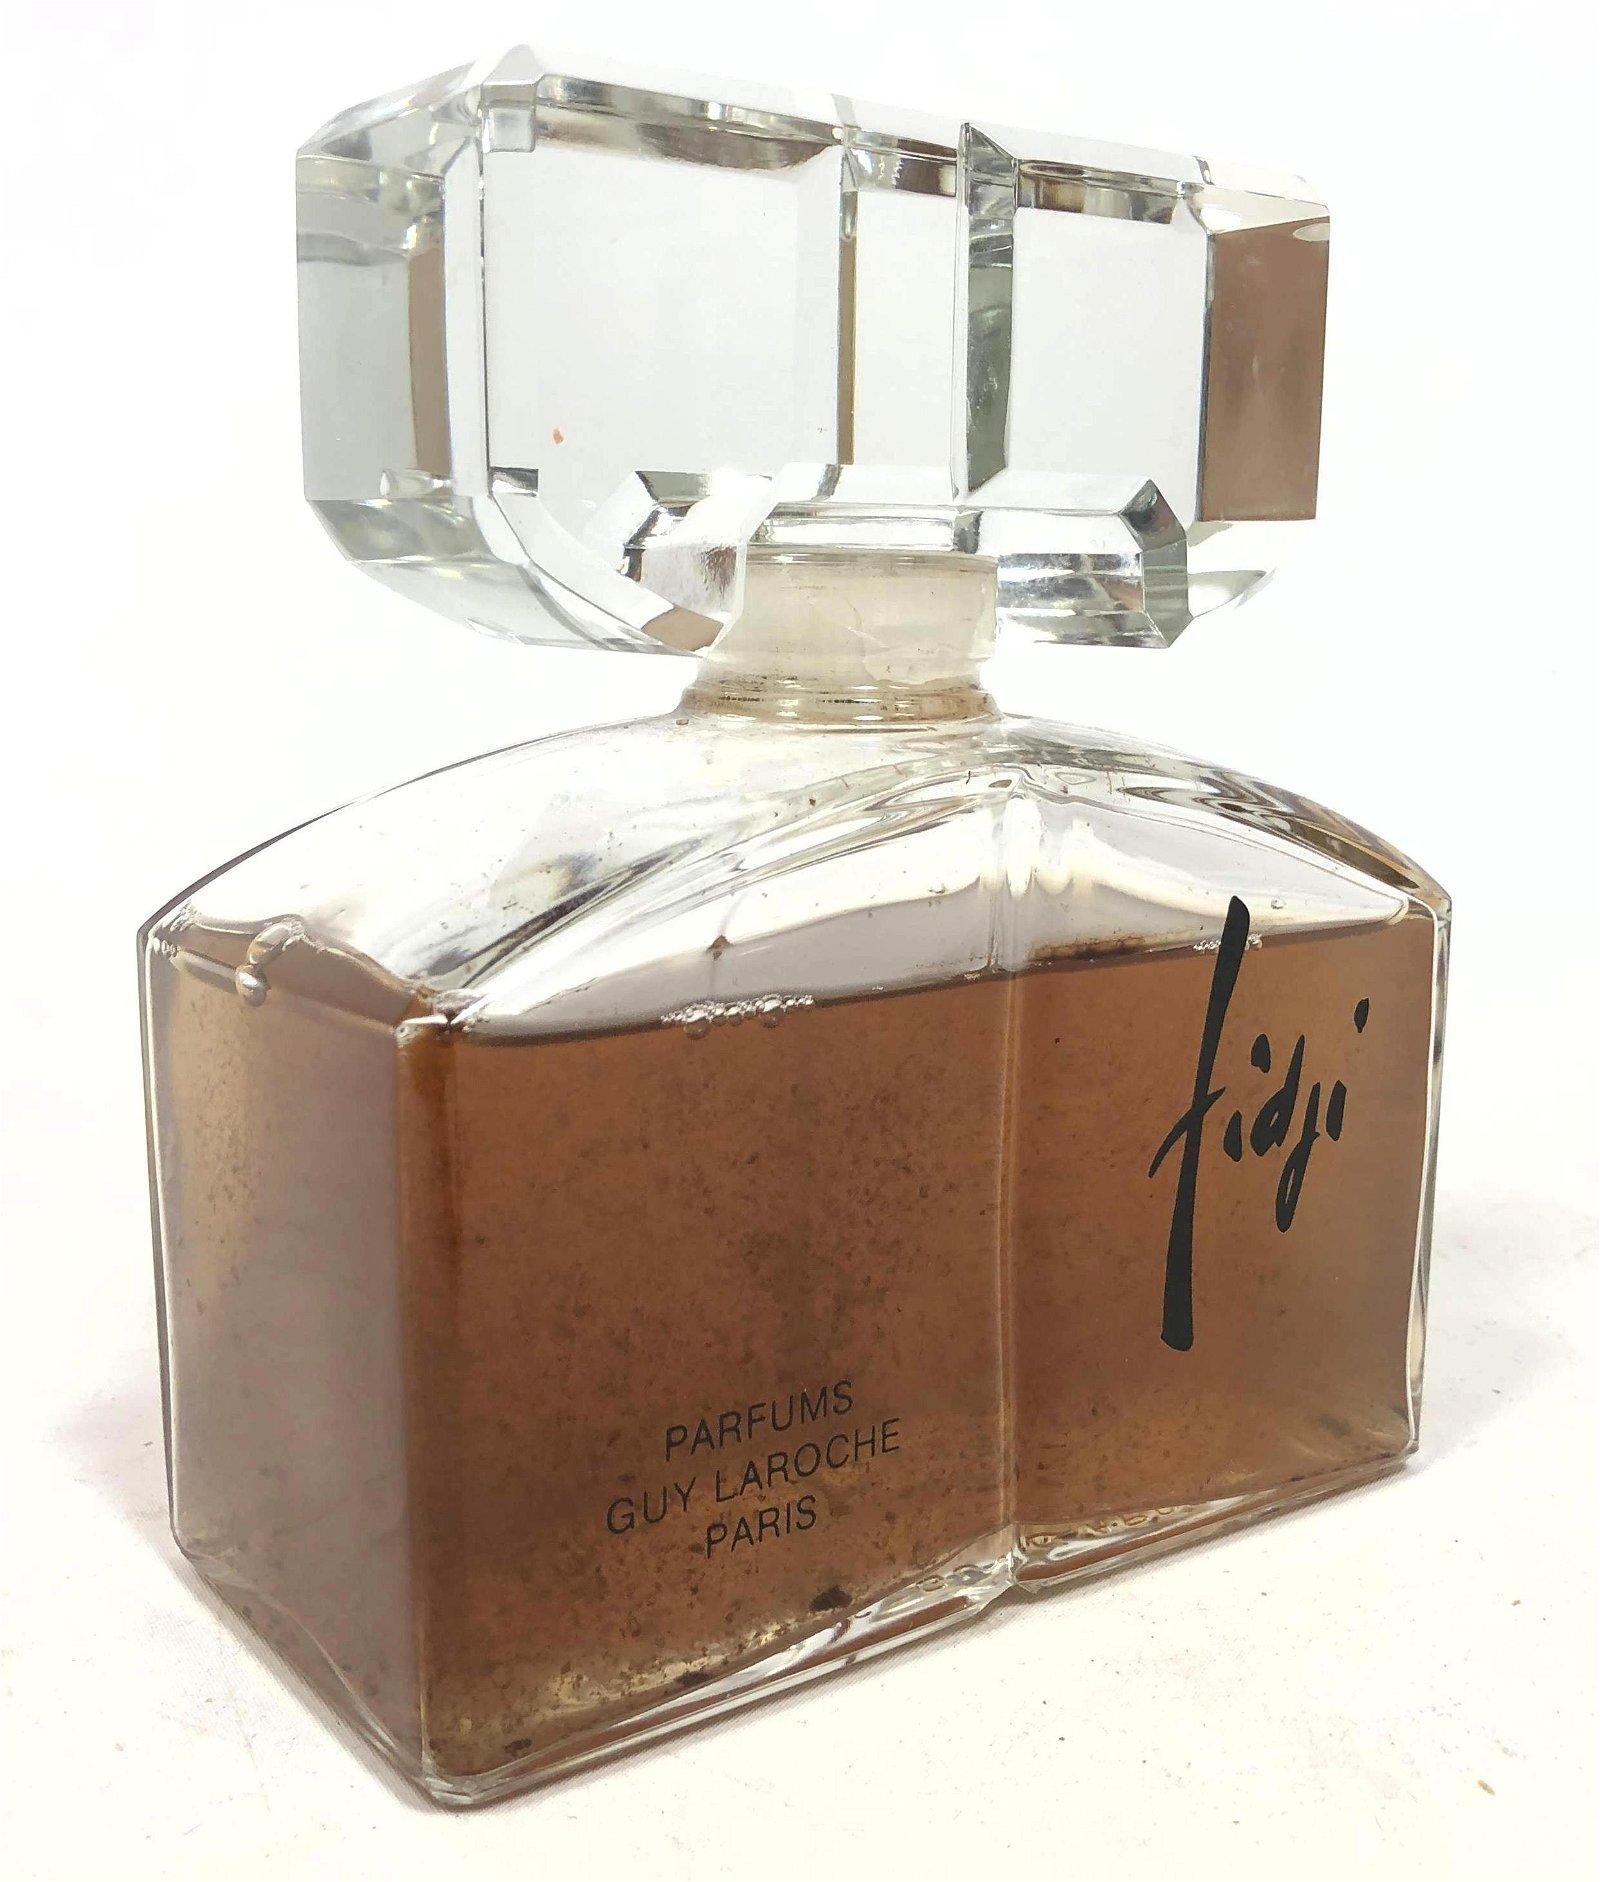 Large Fidji Glass Store Perfume Display Bottle. Filled